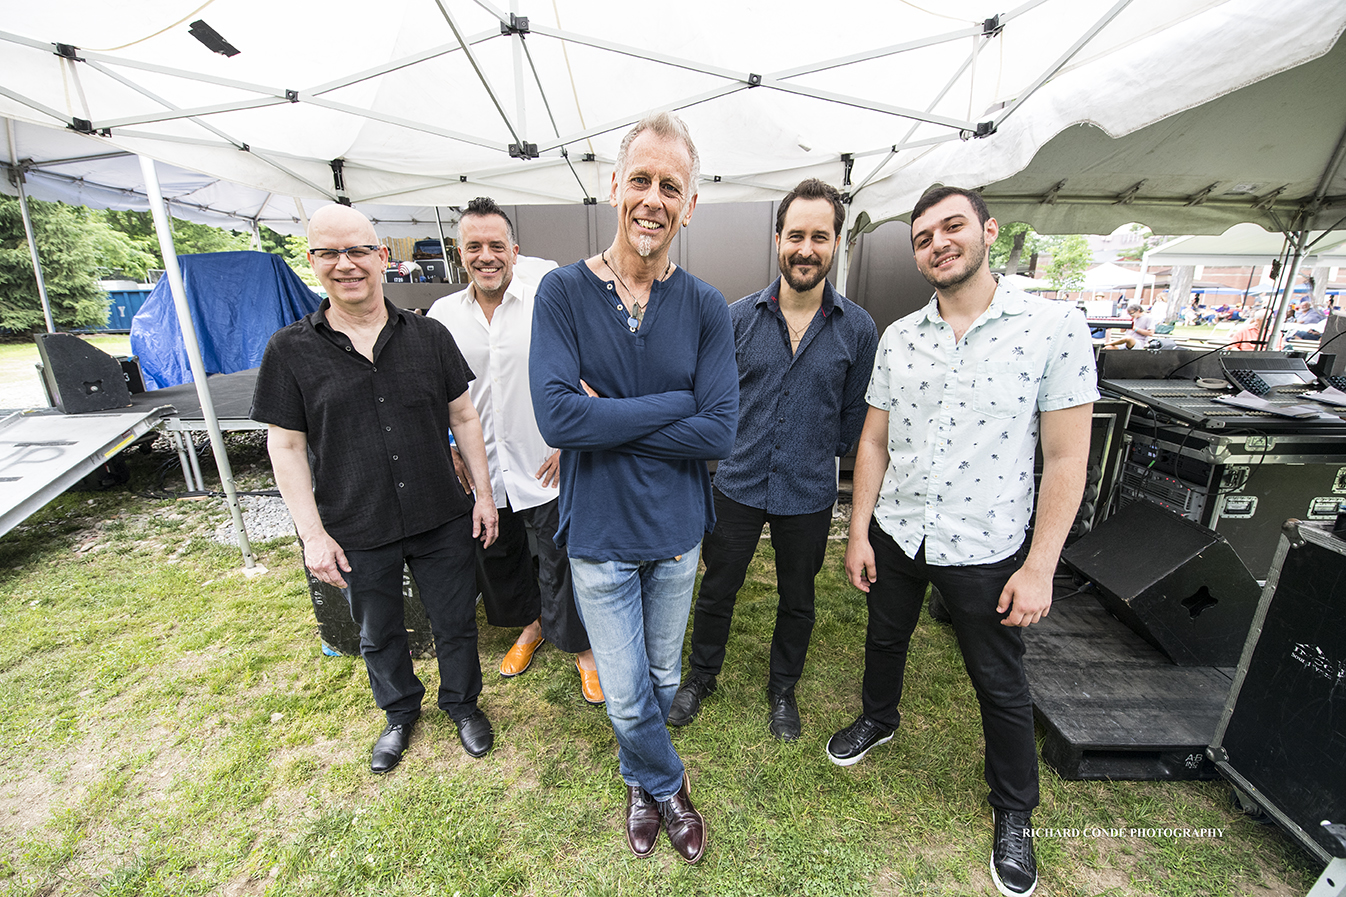 Joe Locke Quartet at the Saratoga Jazz Festival